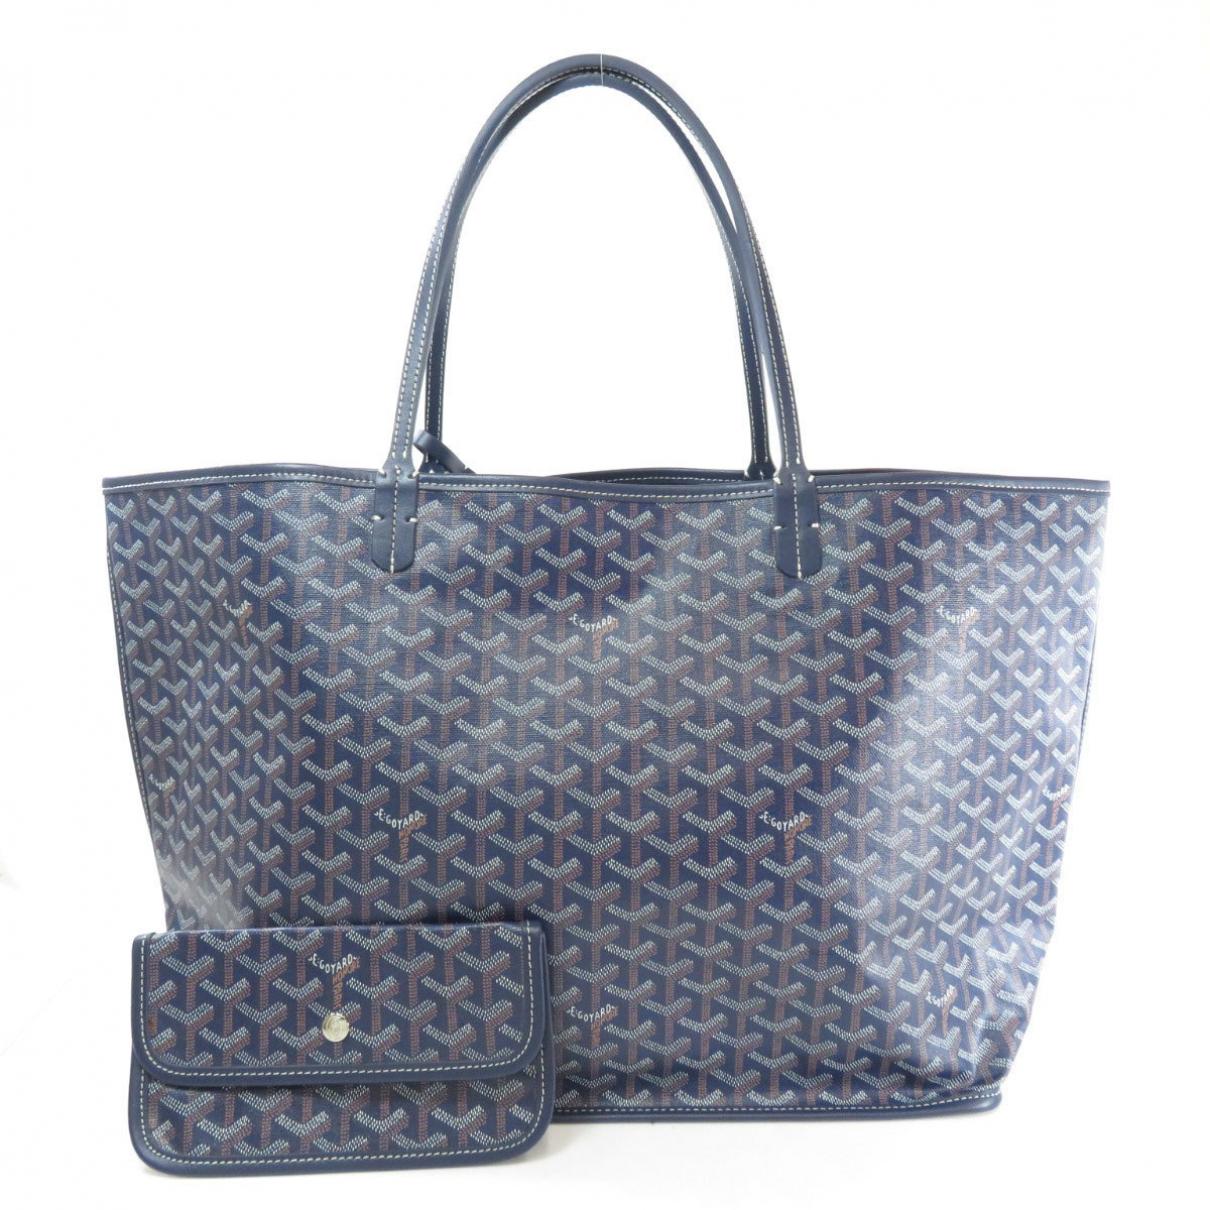 Goyard Saint-Louis leather handbag